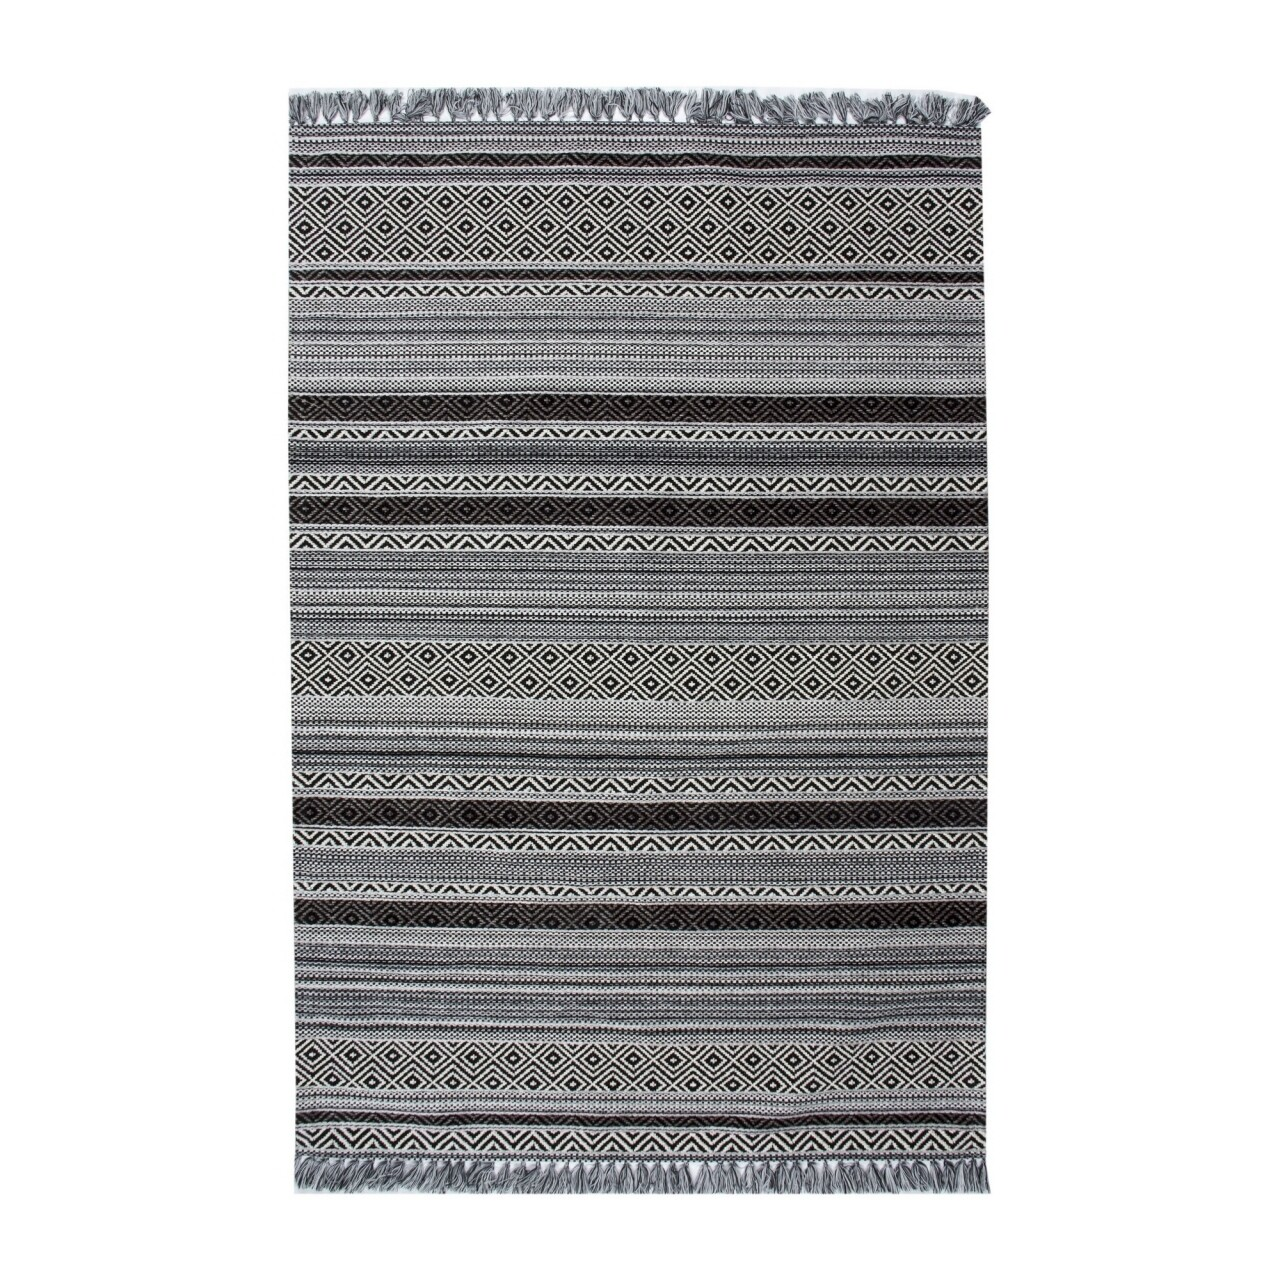 Covor rezistent IN 02 - White, Black, 120x180 cm